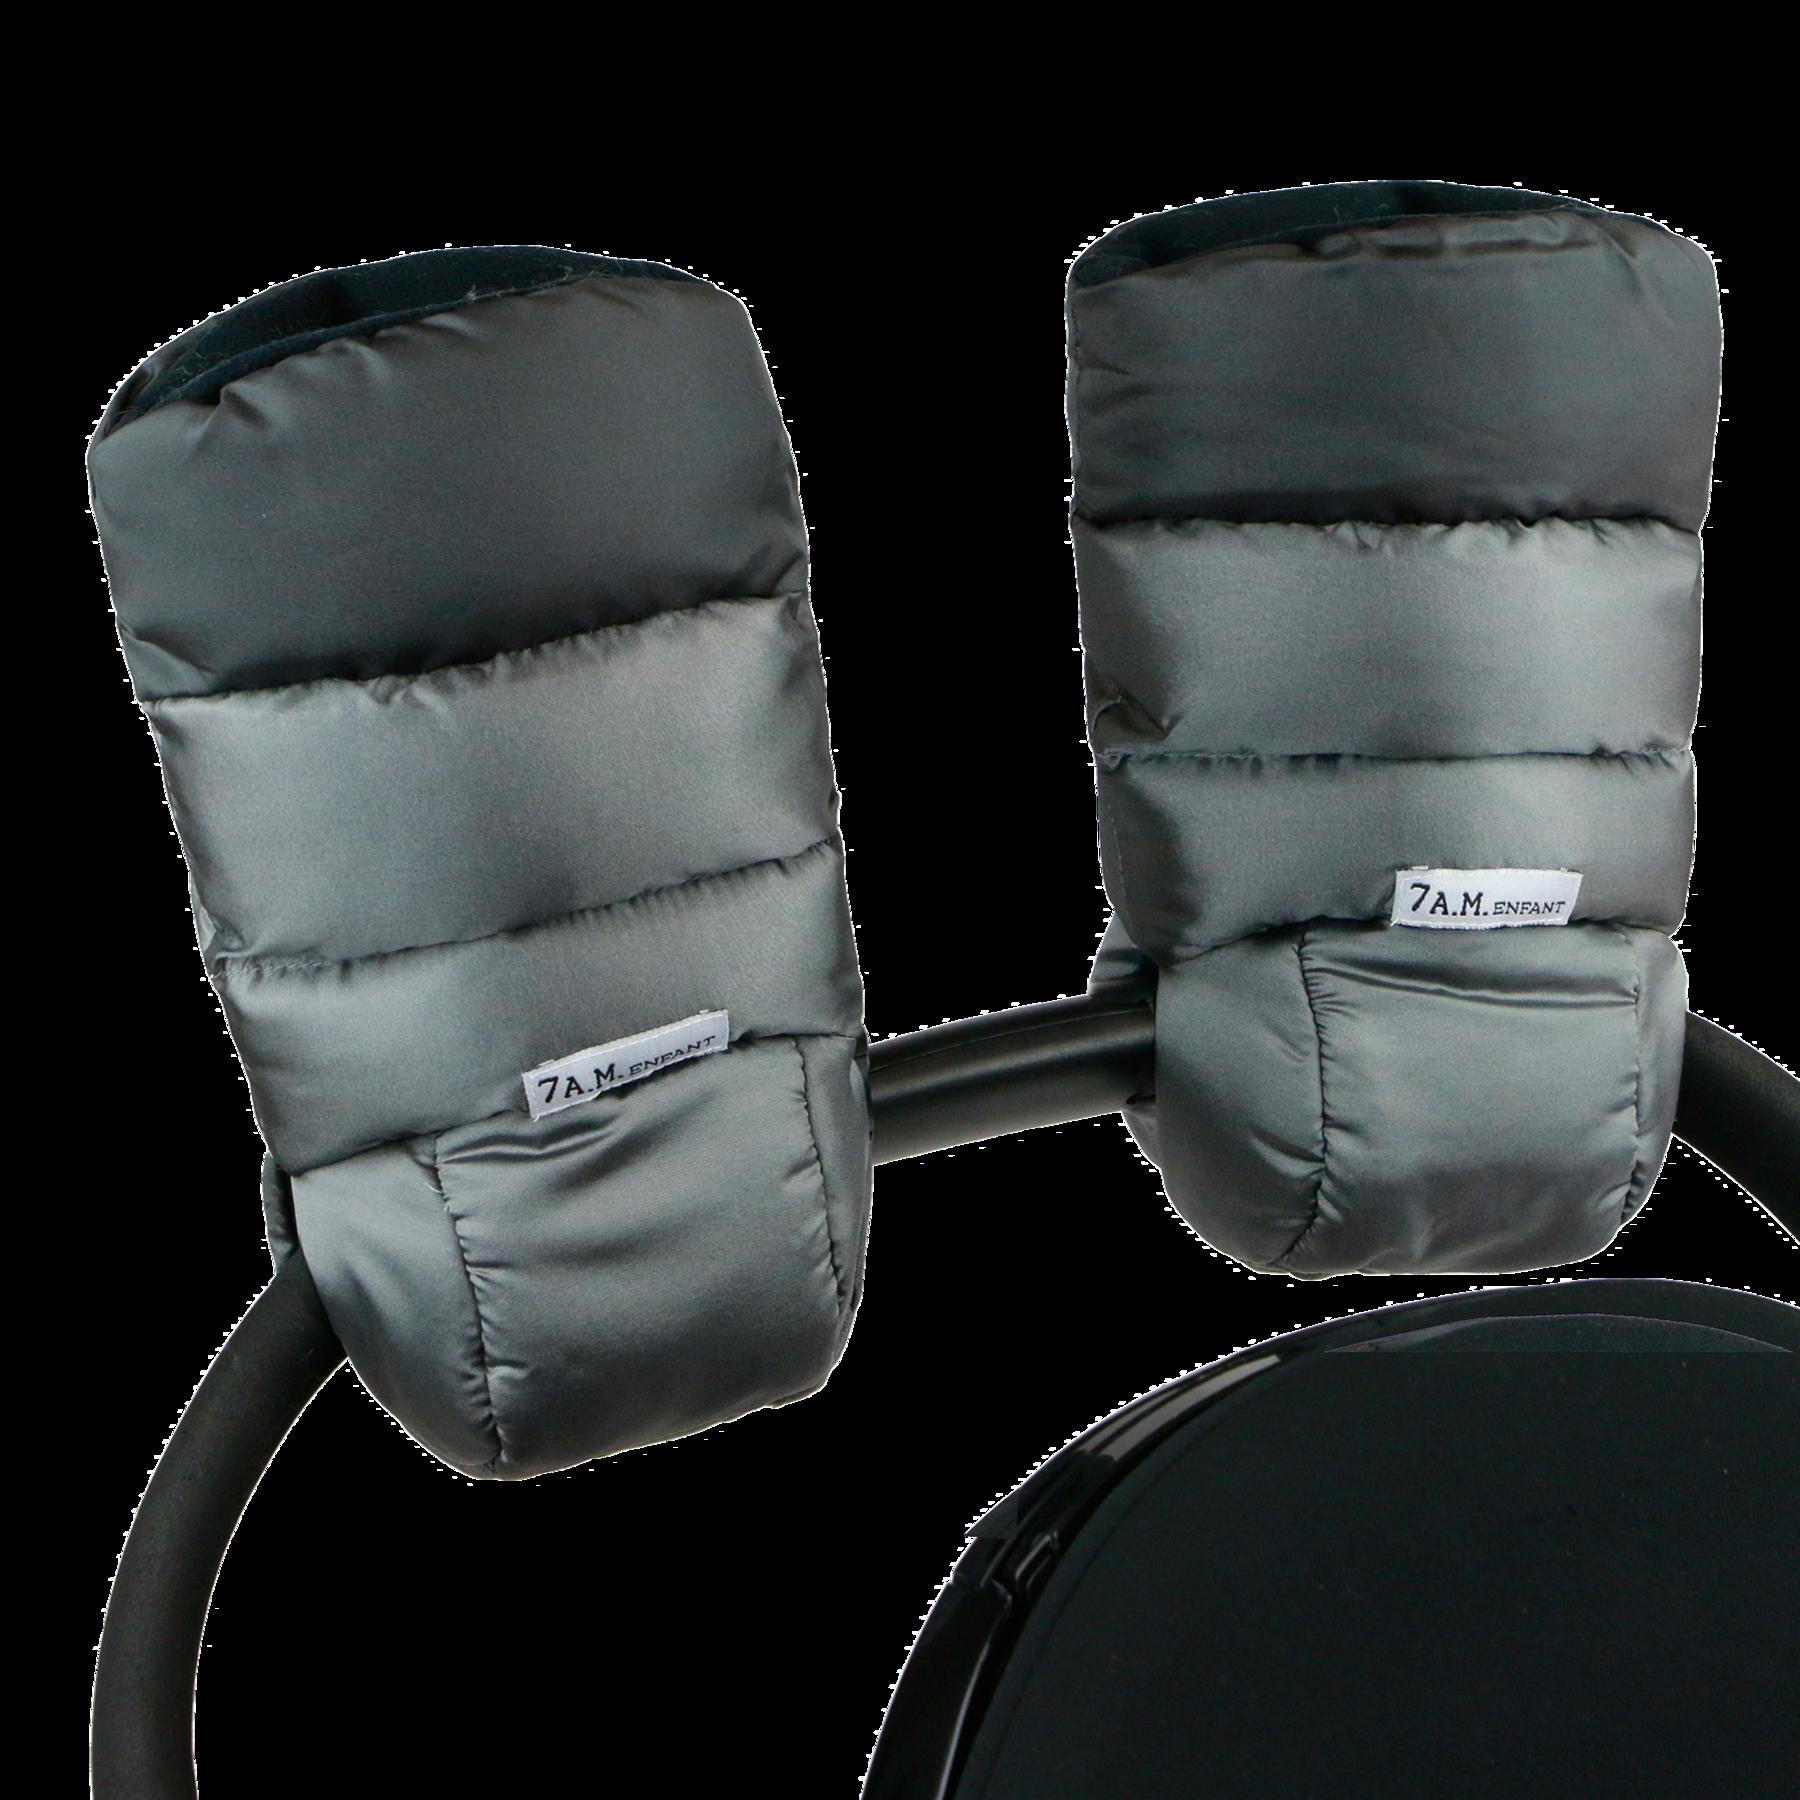 7AM - Mufki do wózka Metallic Silver/Metallic Charcoal